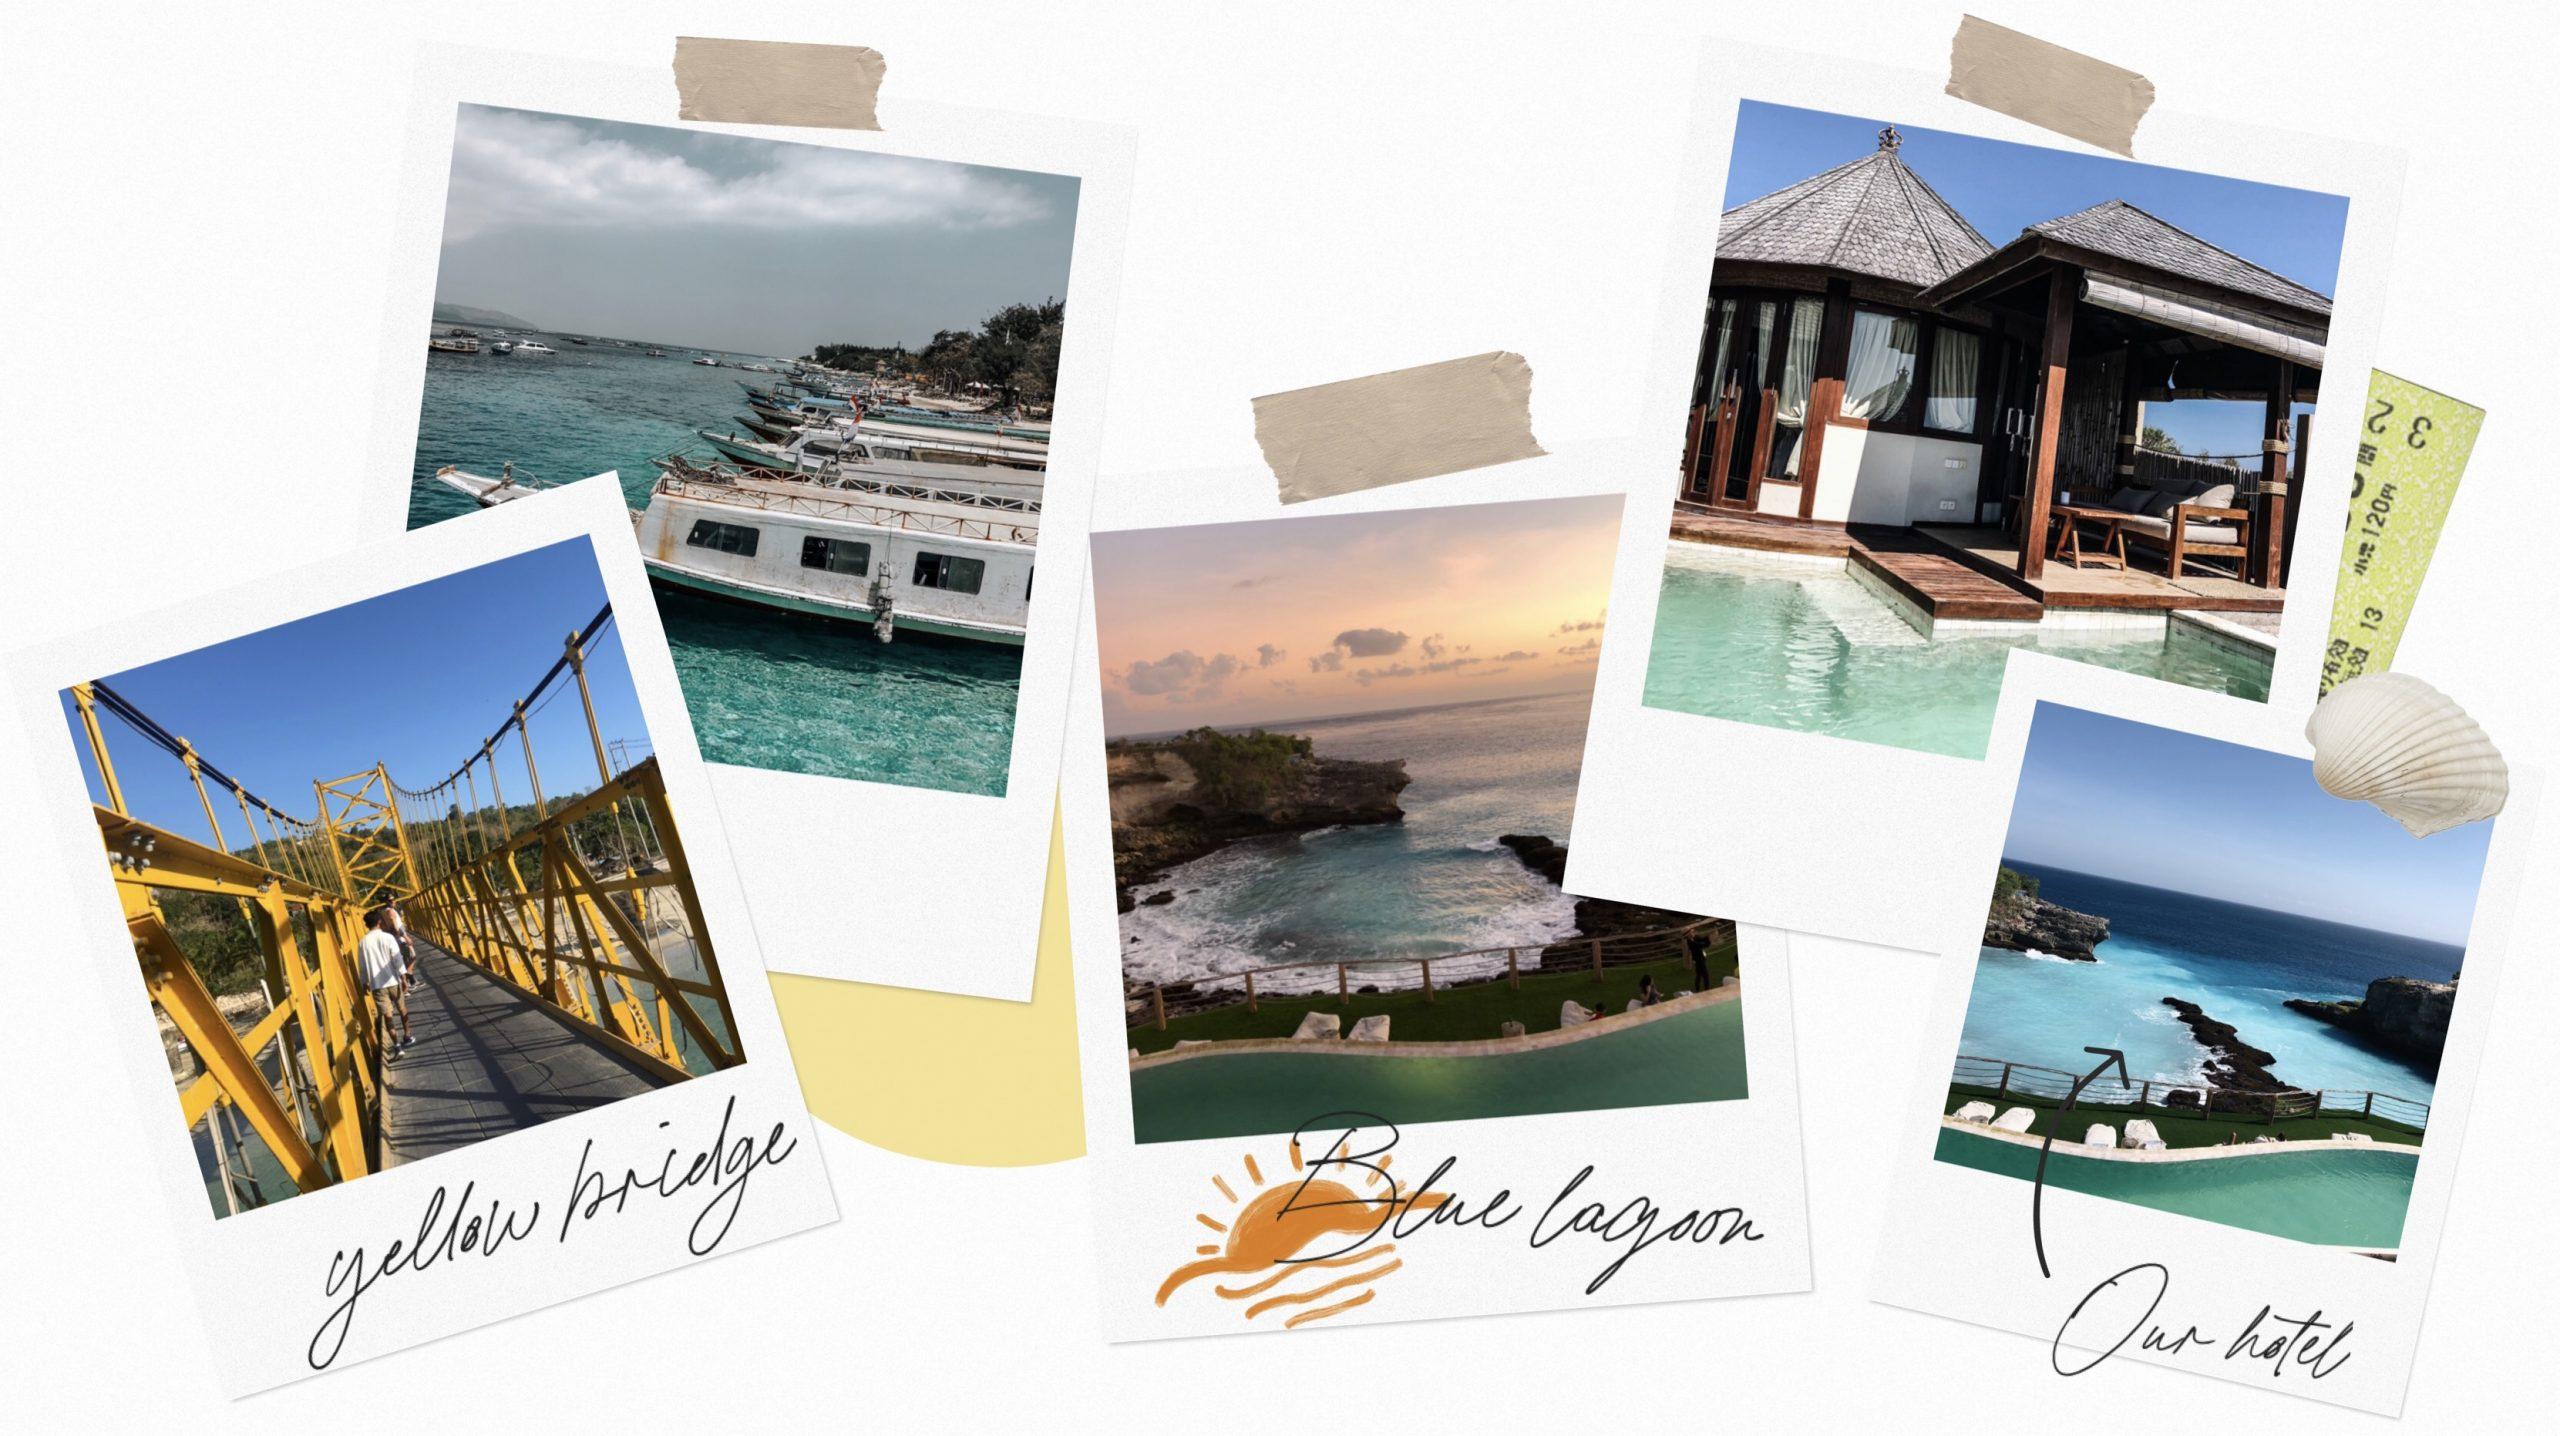 Bali plages piscines